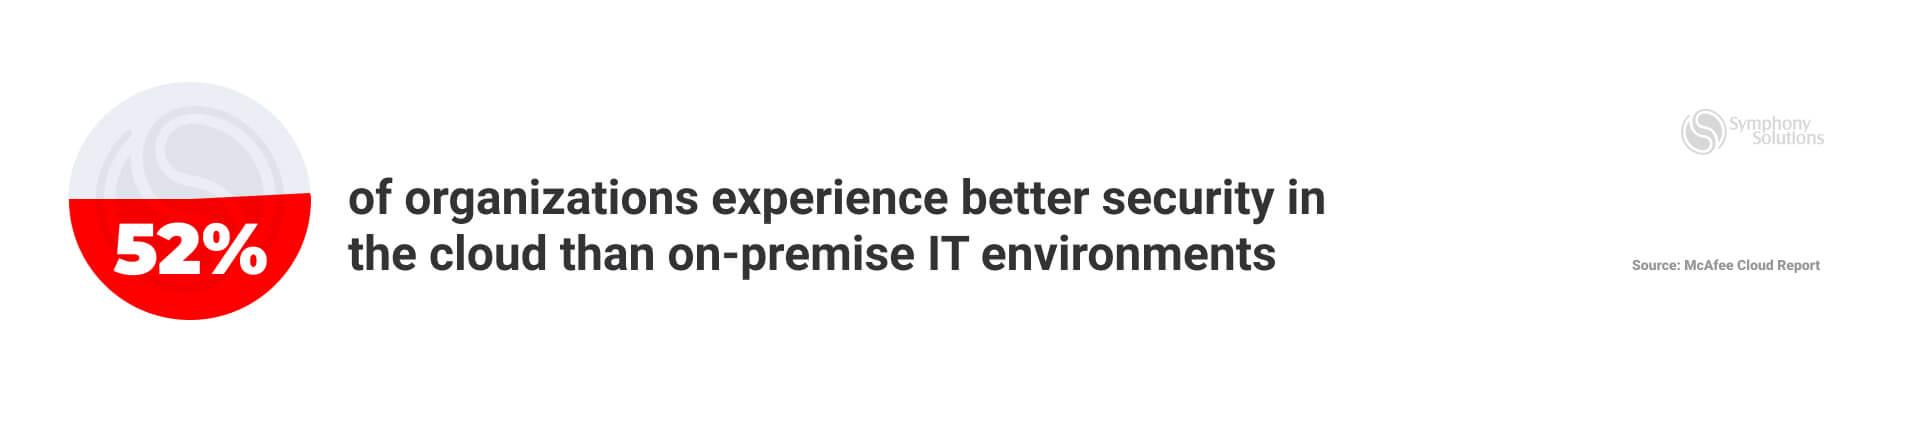 Cloud-based IT environments vs. On-premise IT environments